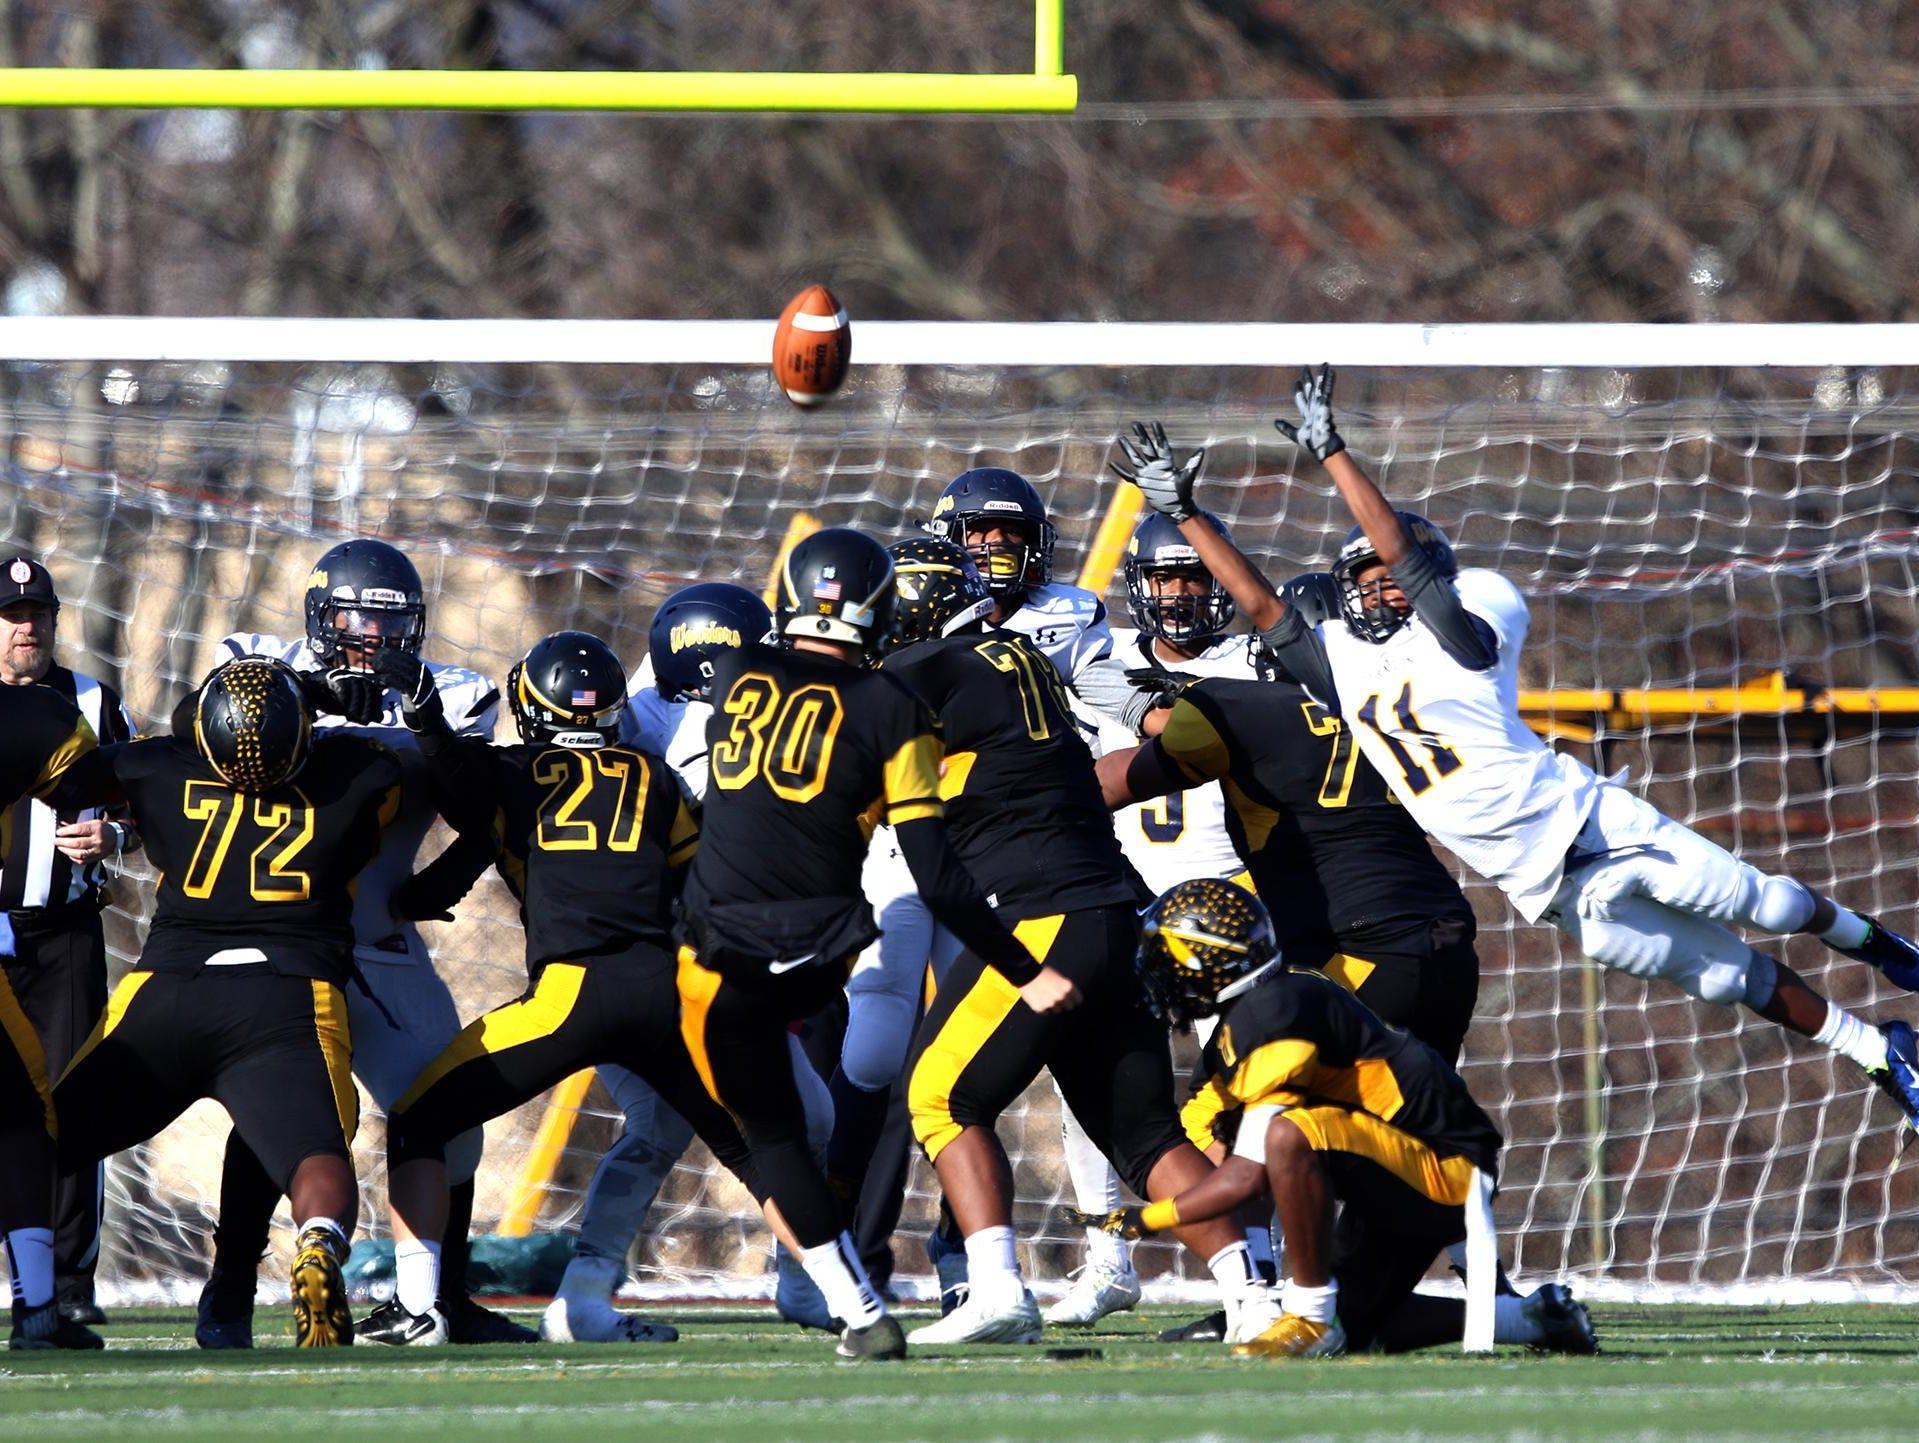 Franklin high school football vs Piscataway at Piscataway extra point.